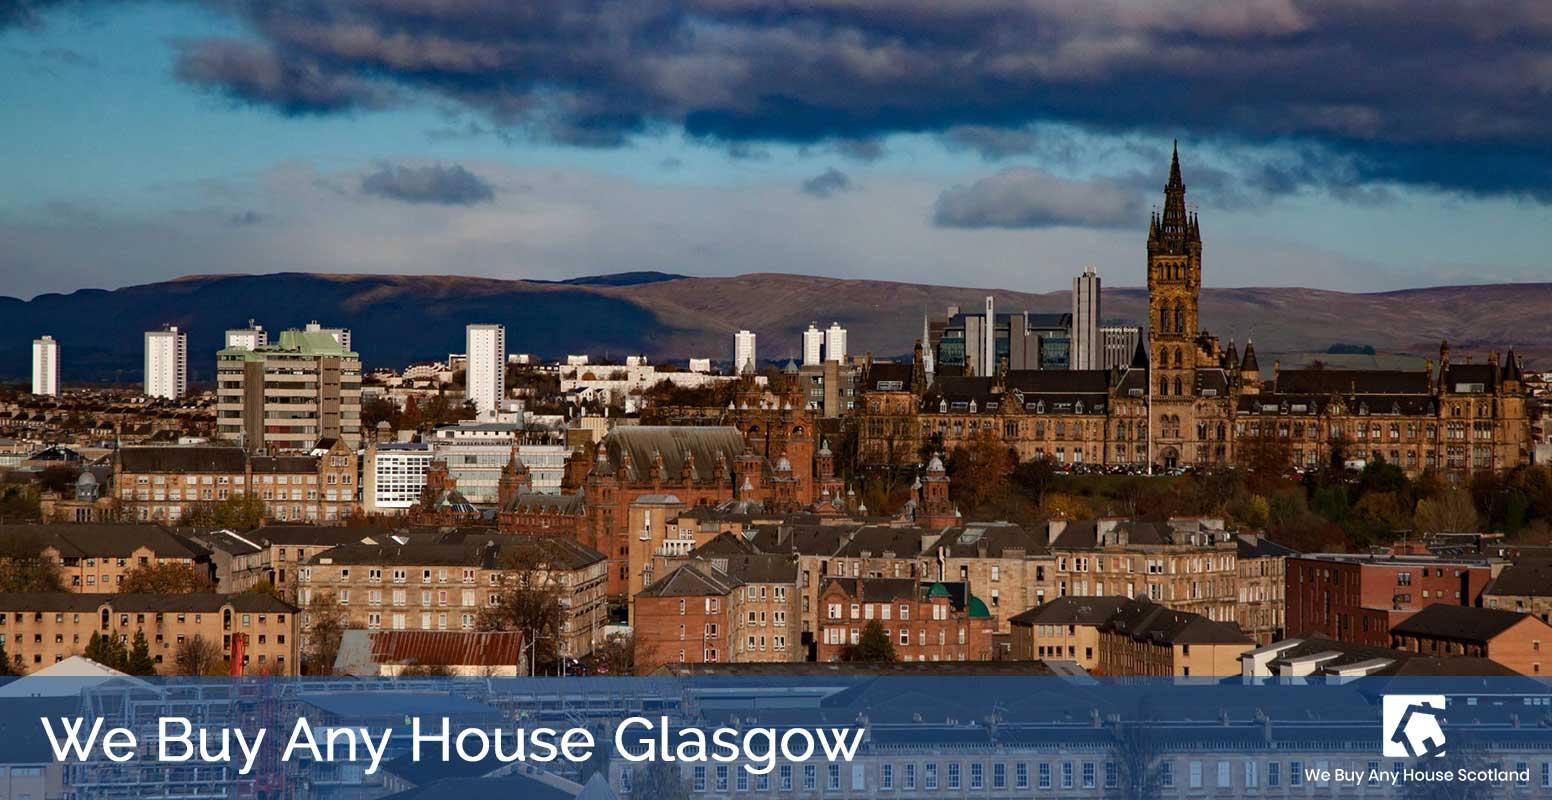 We Buy Any House Glasgow